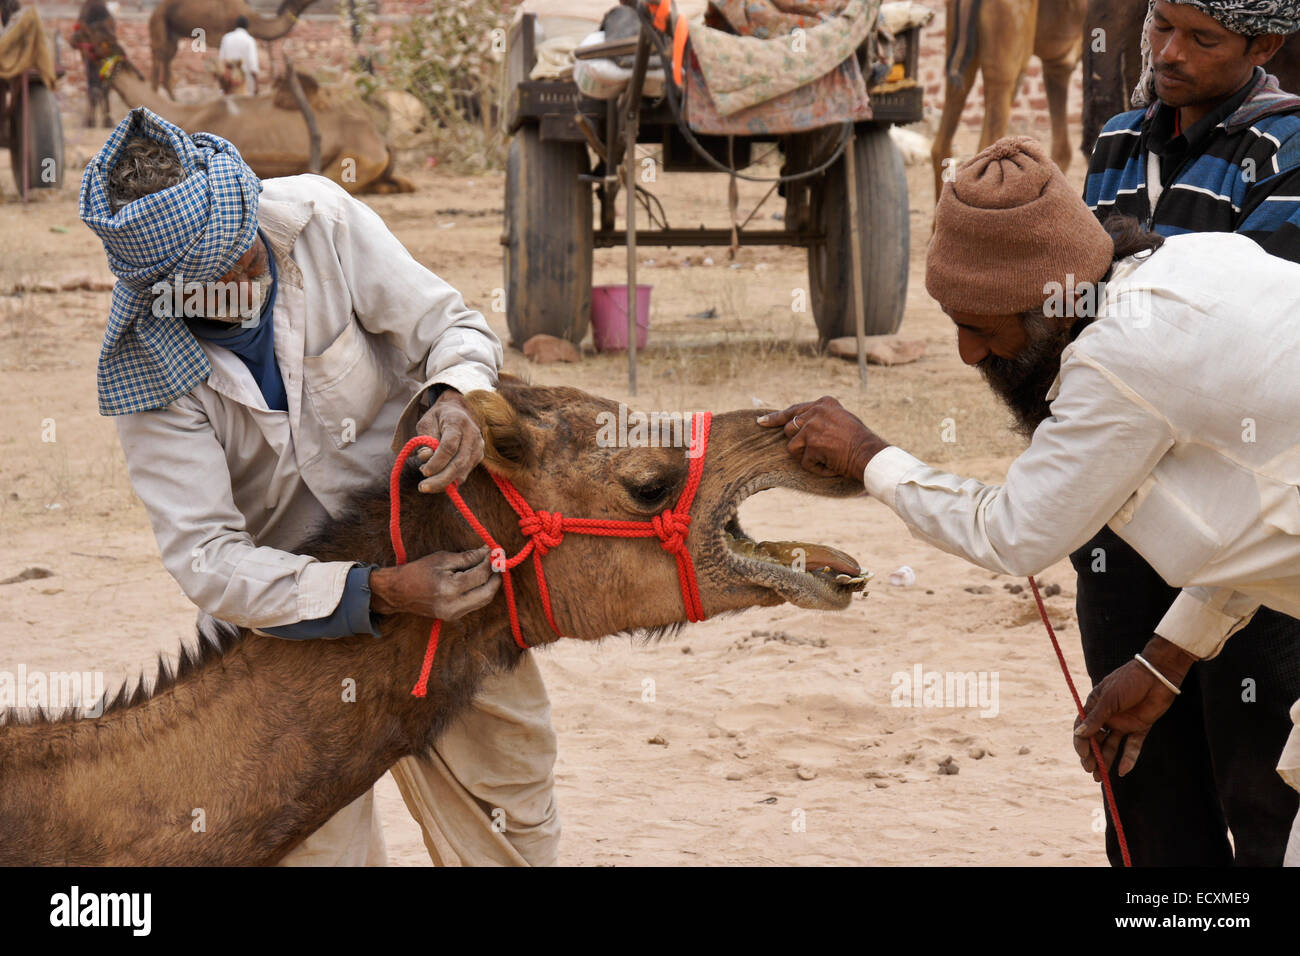 Camel seller and prospective buyer, Nagaur Fair, Rajasthan, India - Stock Image